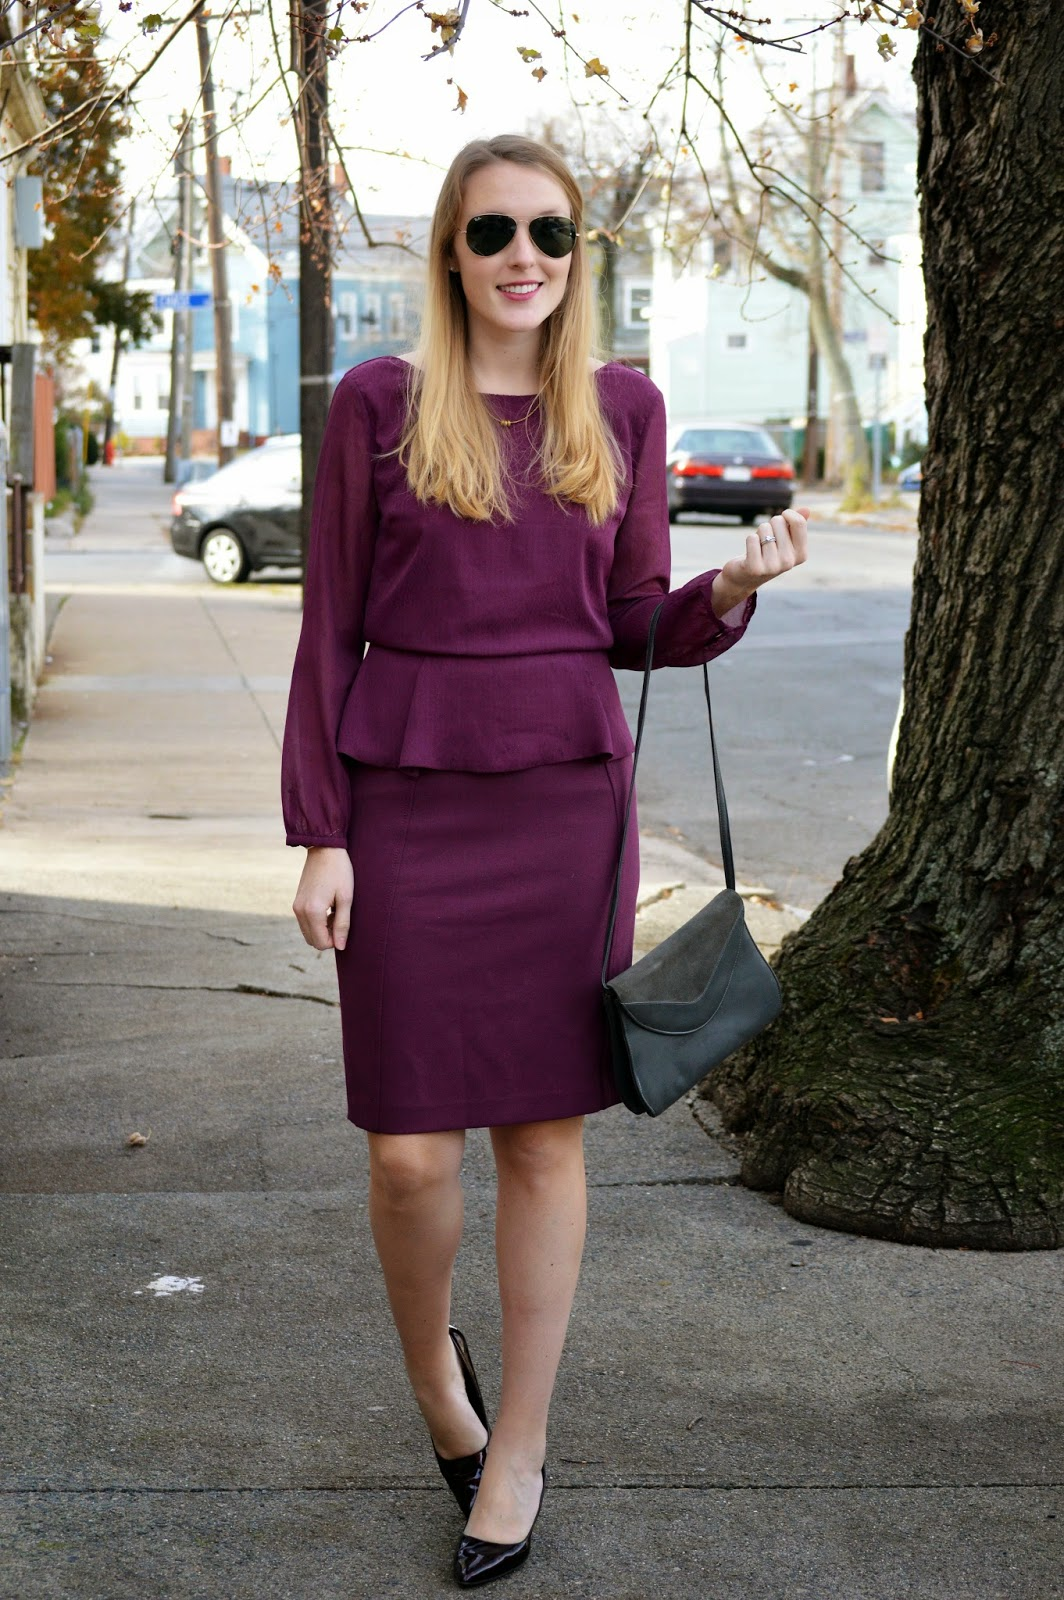 women's fall fashion monochrome magenta